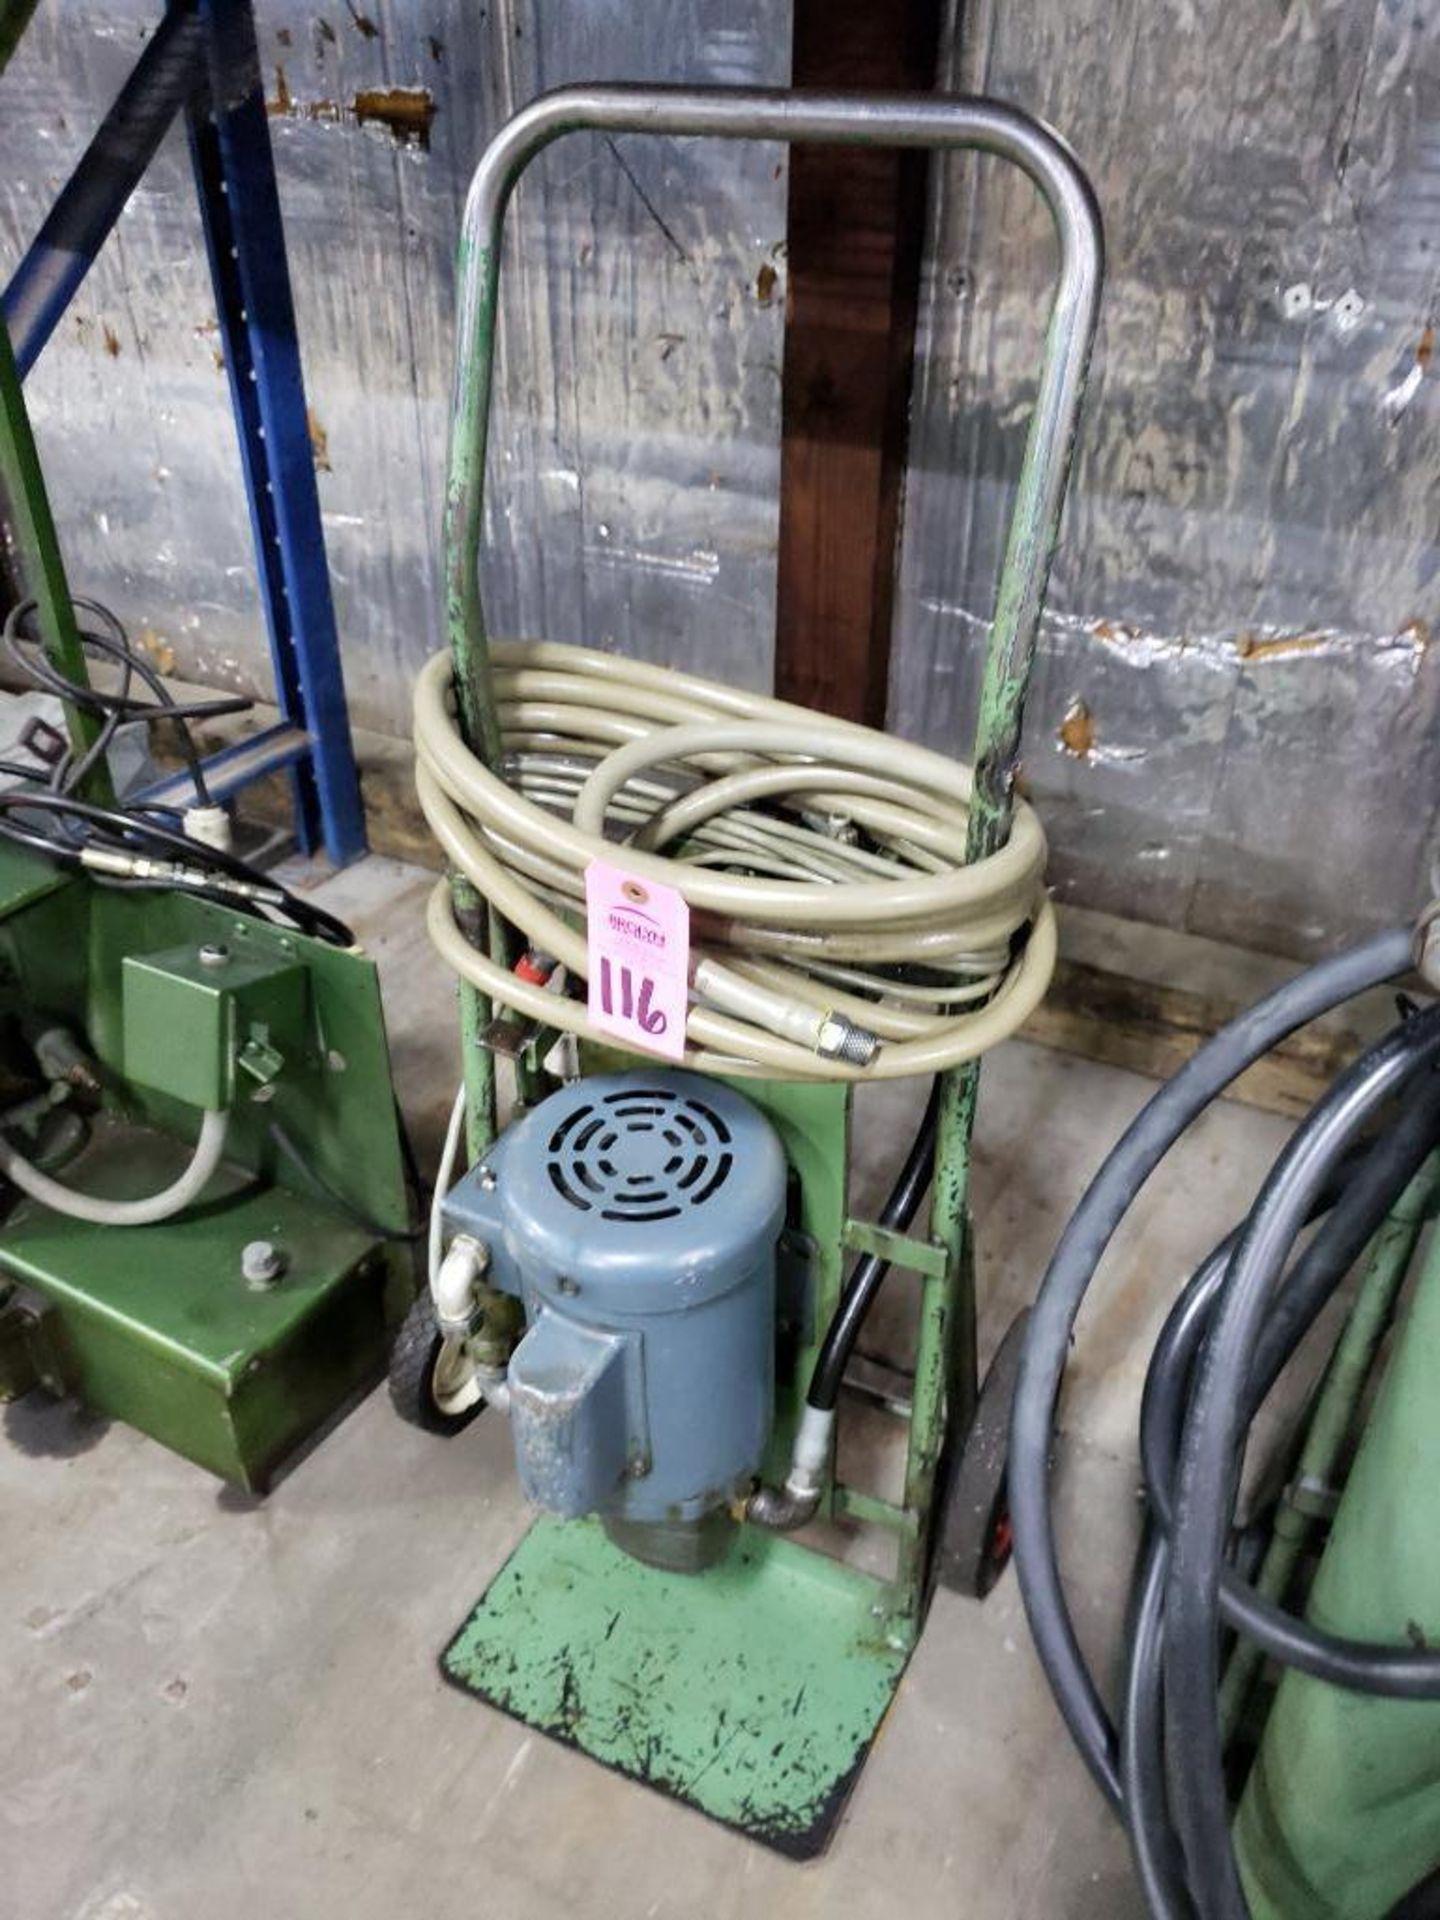 Lot 116 - Hydraulic fluid filtration unit. Single phase 110v.